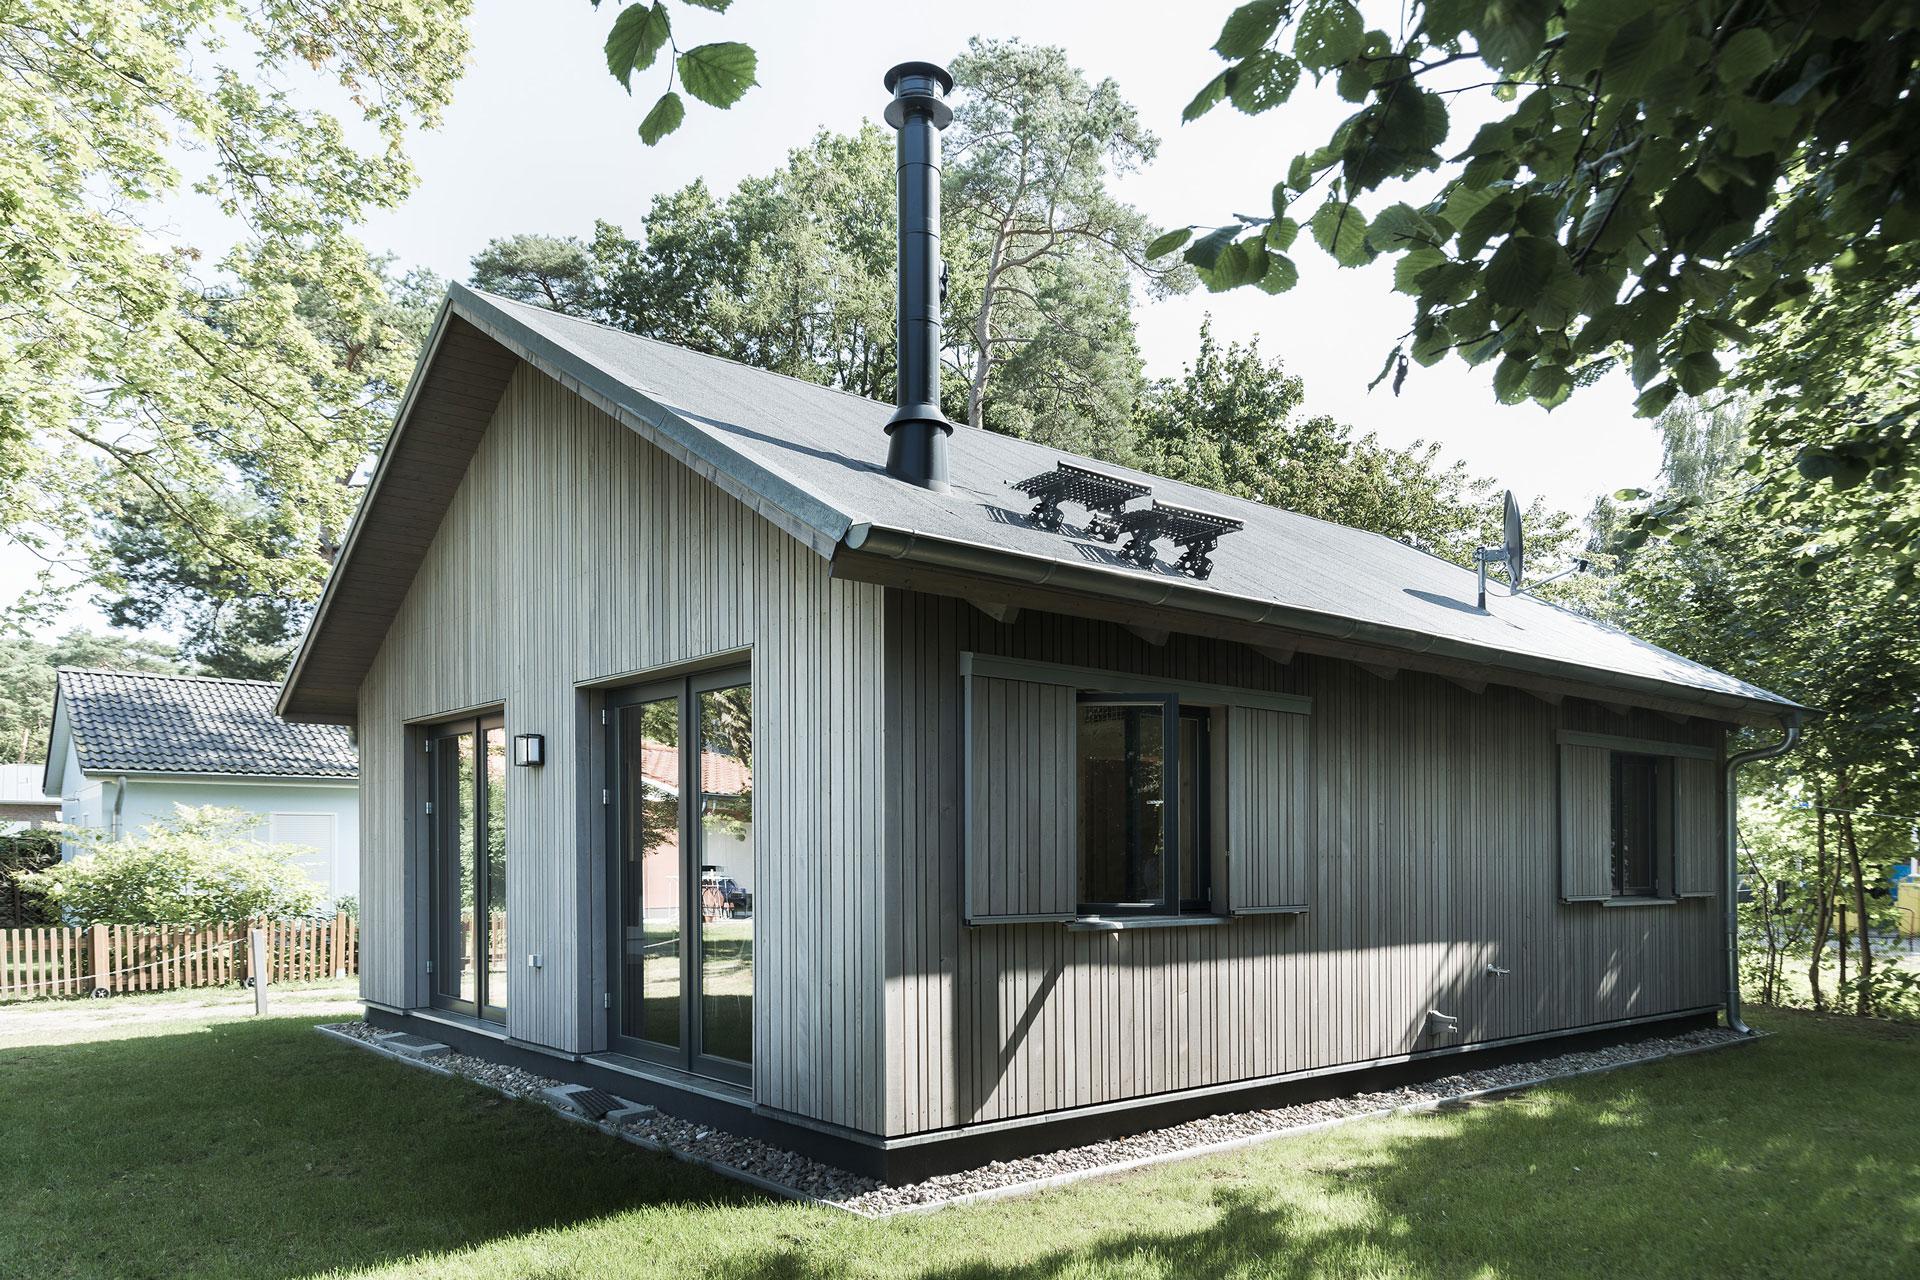 Ferienhaus im Landkreis NWM (01) / Totale